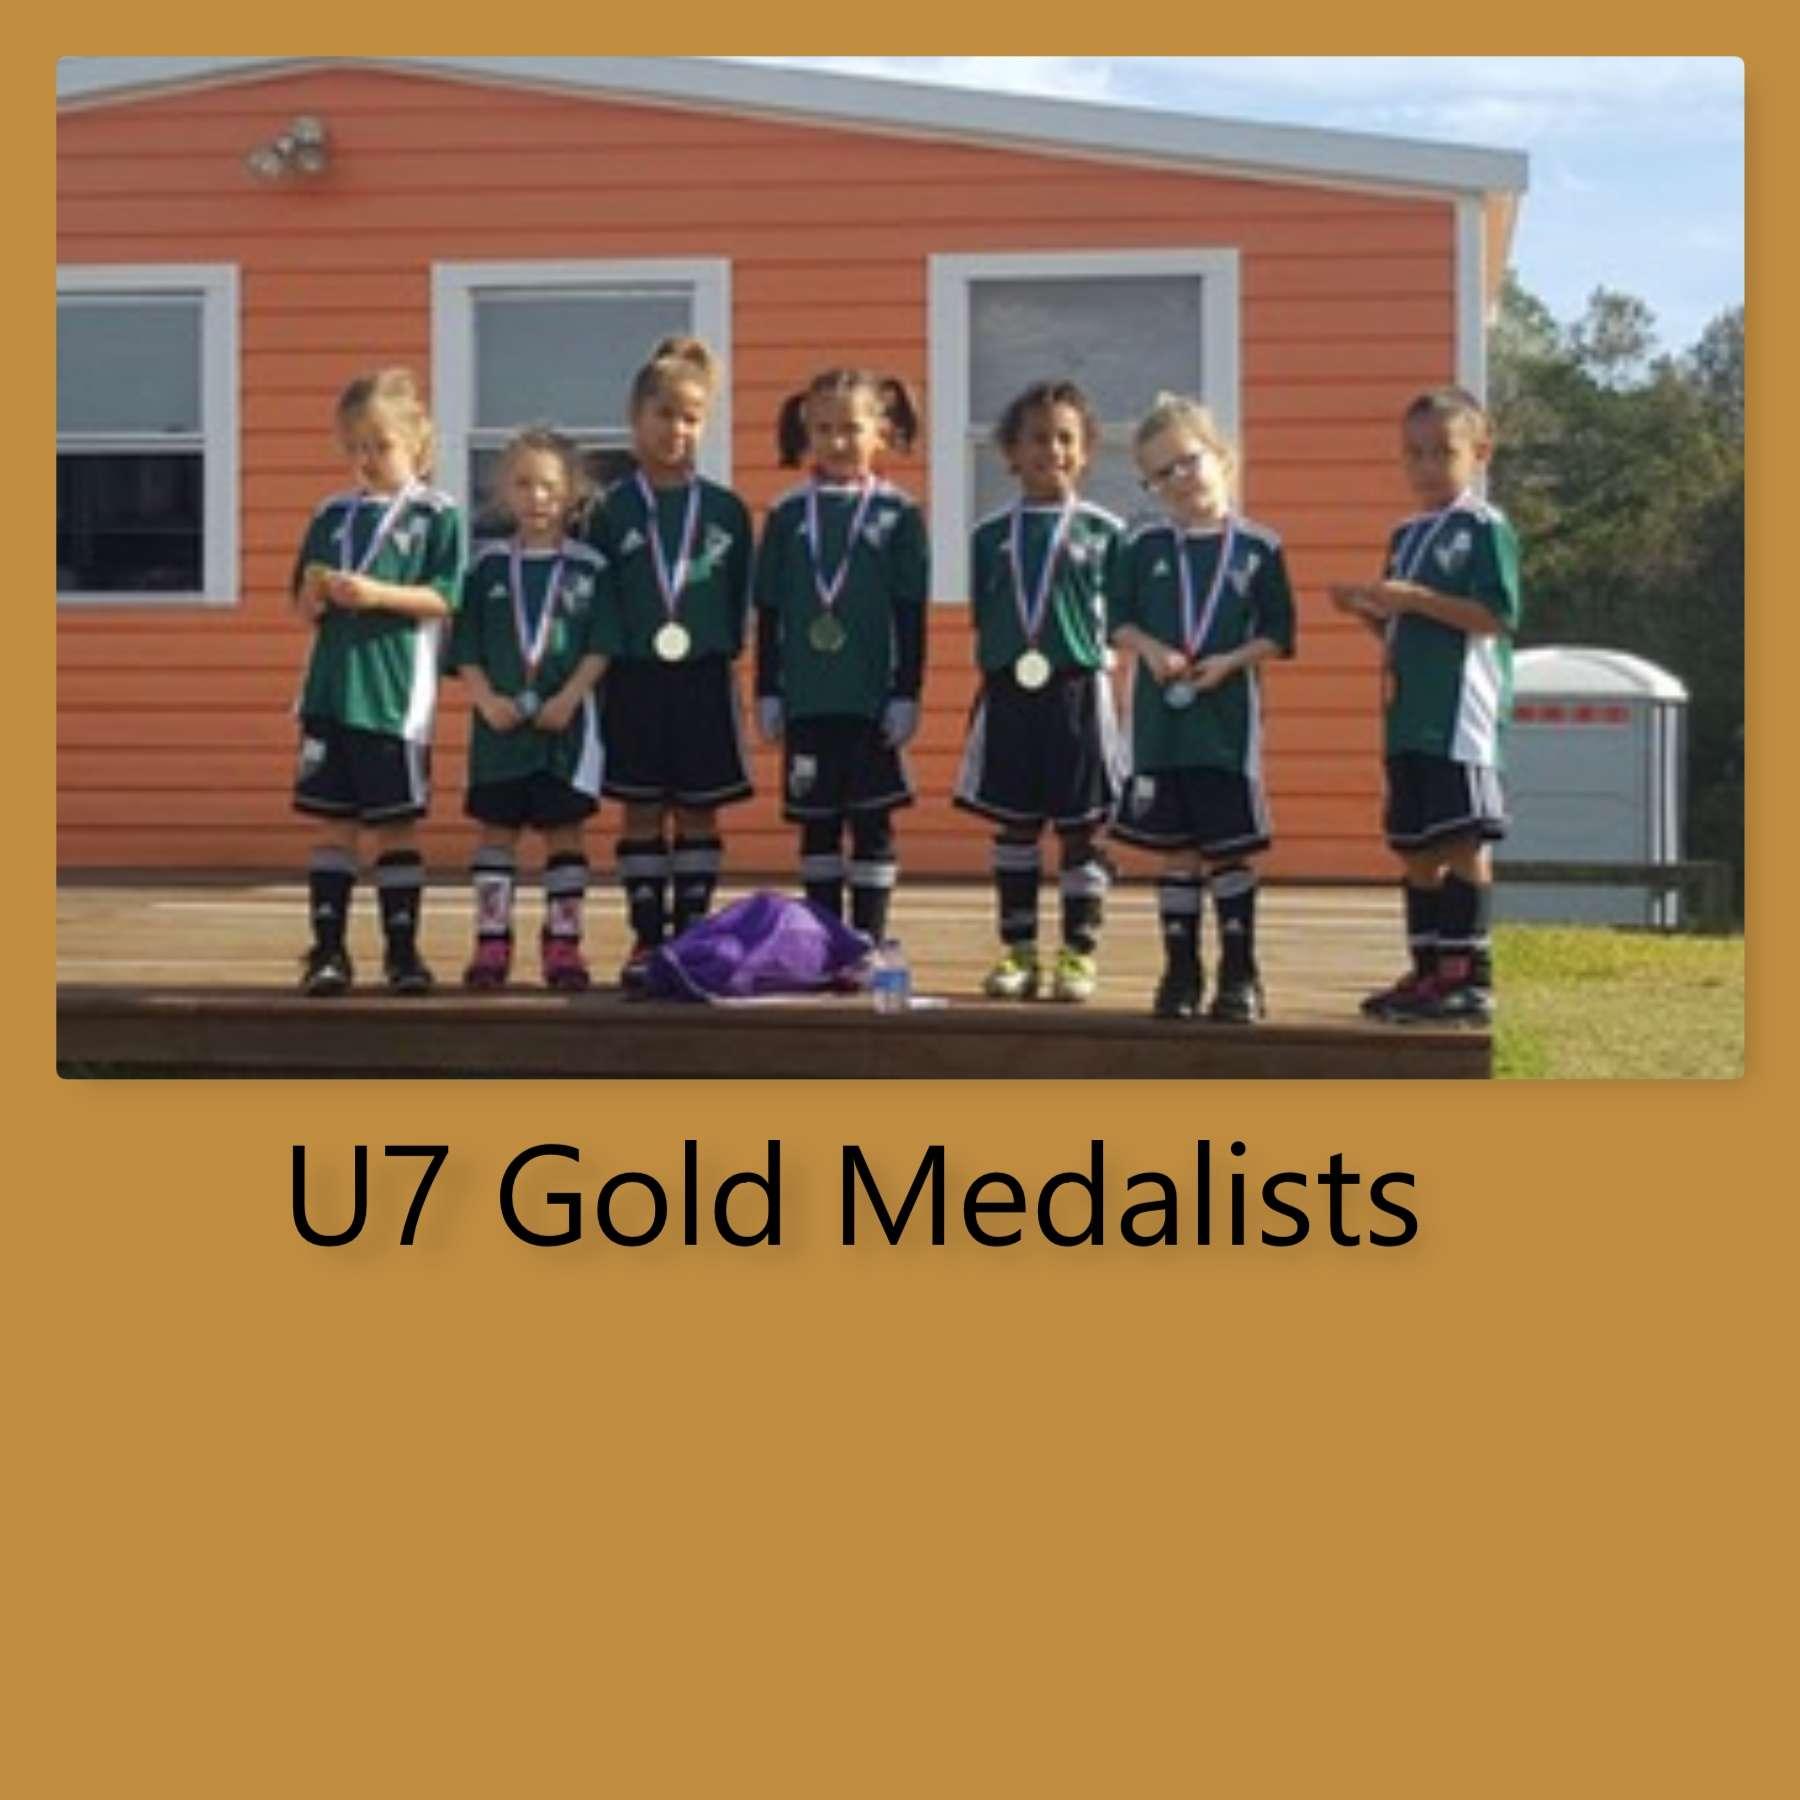 U7 Goldmedalists